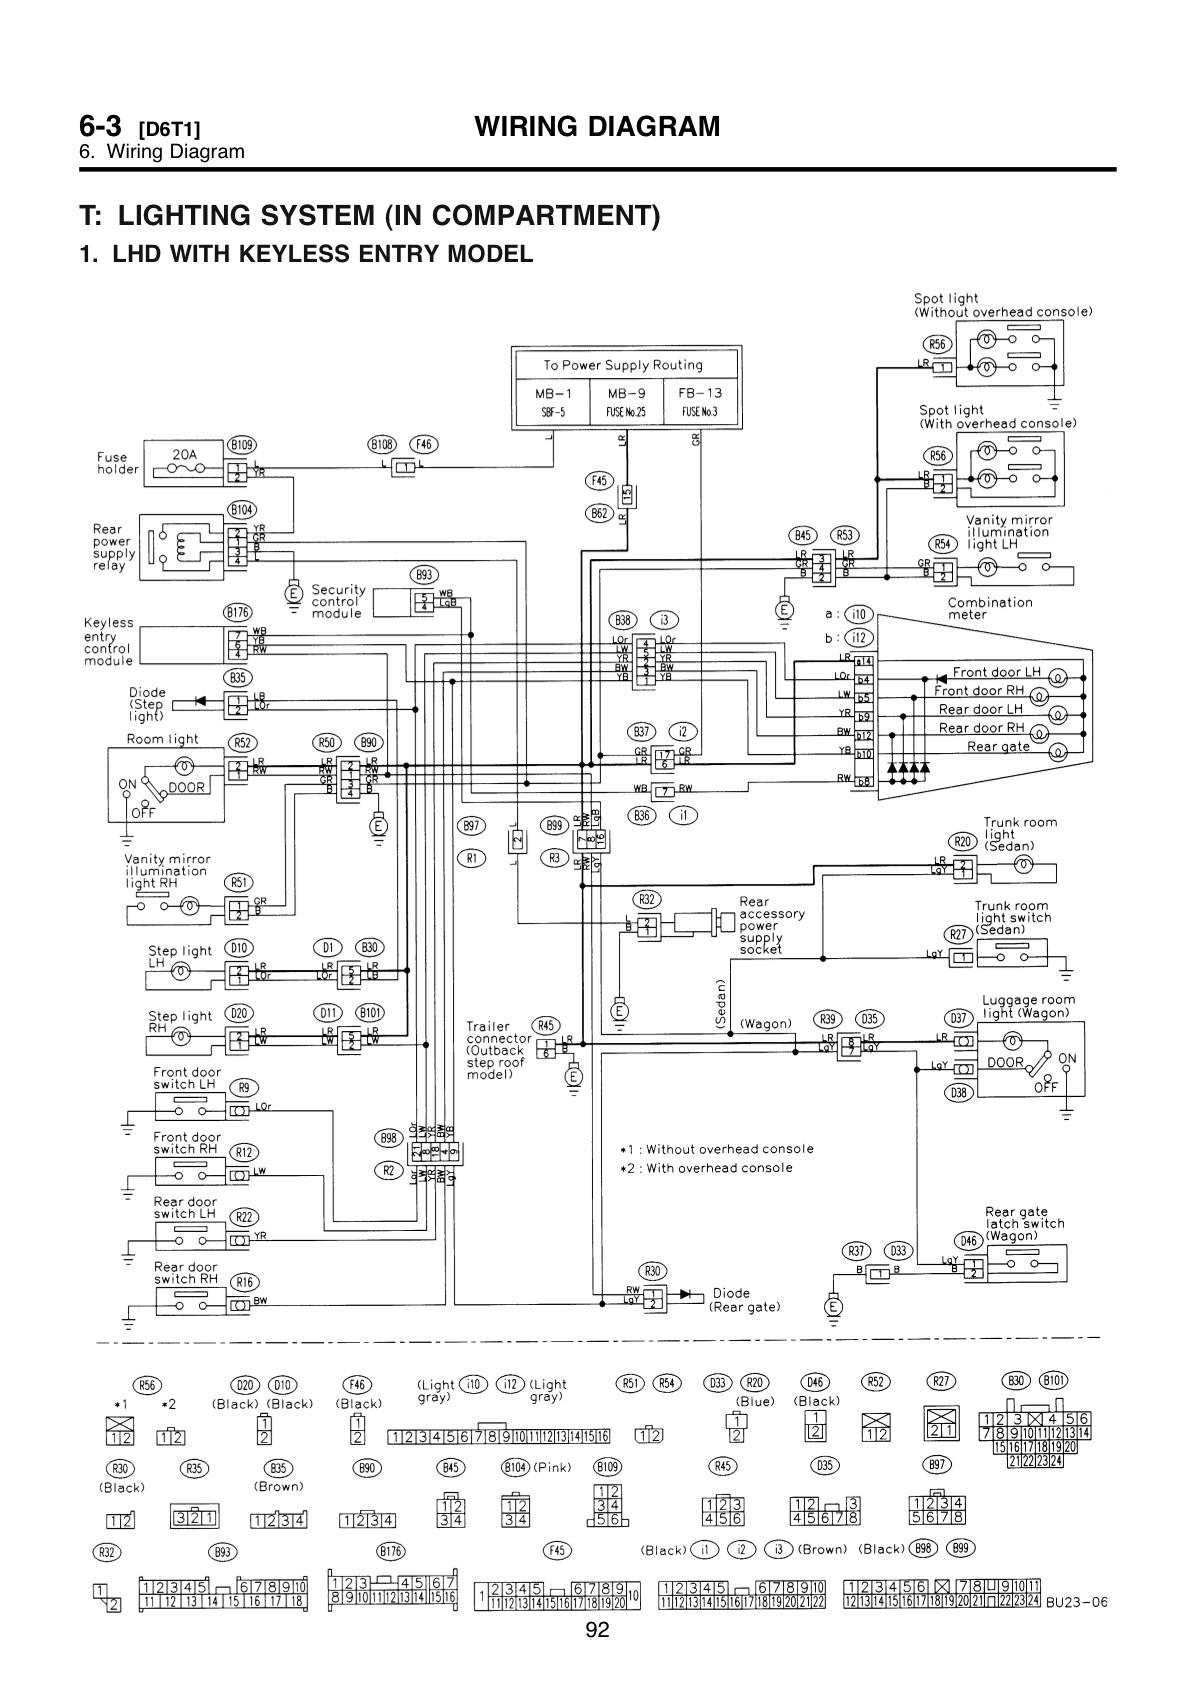 hight resolution of 1995 subaru impreza wiring diagram wiring diagram third level rh 1 14 jacobwinterstein com 1993 subaru legacy engine diagram 2011 subaru legacy engine